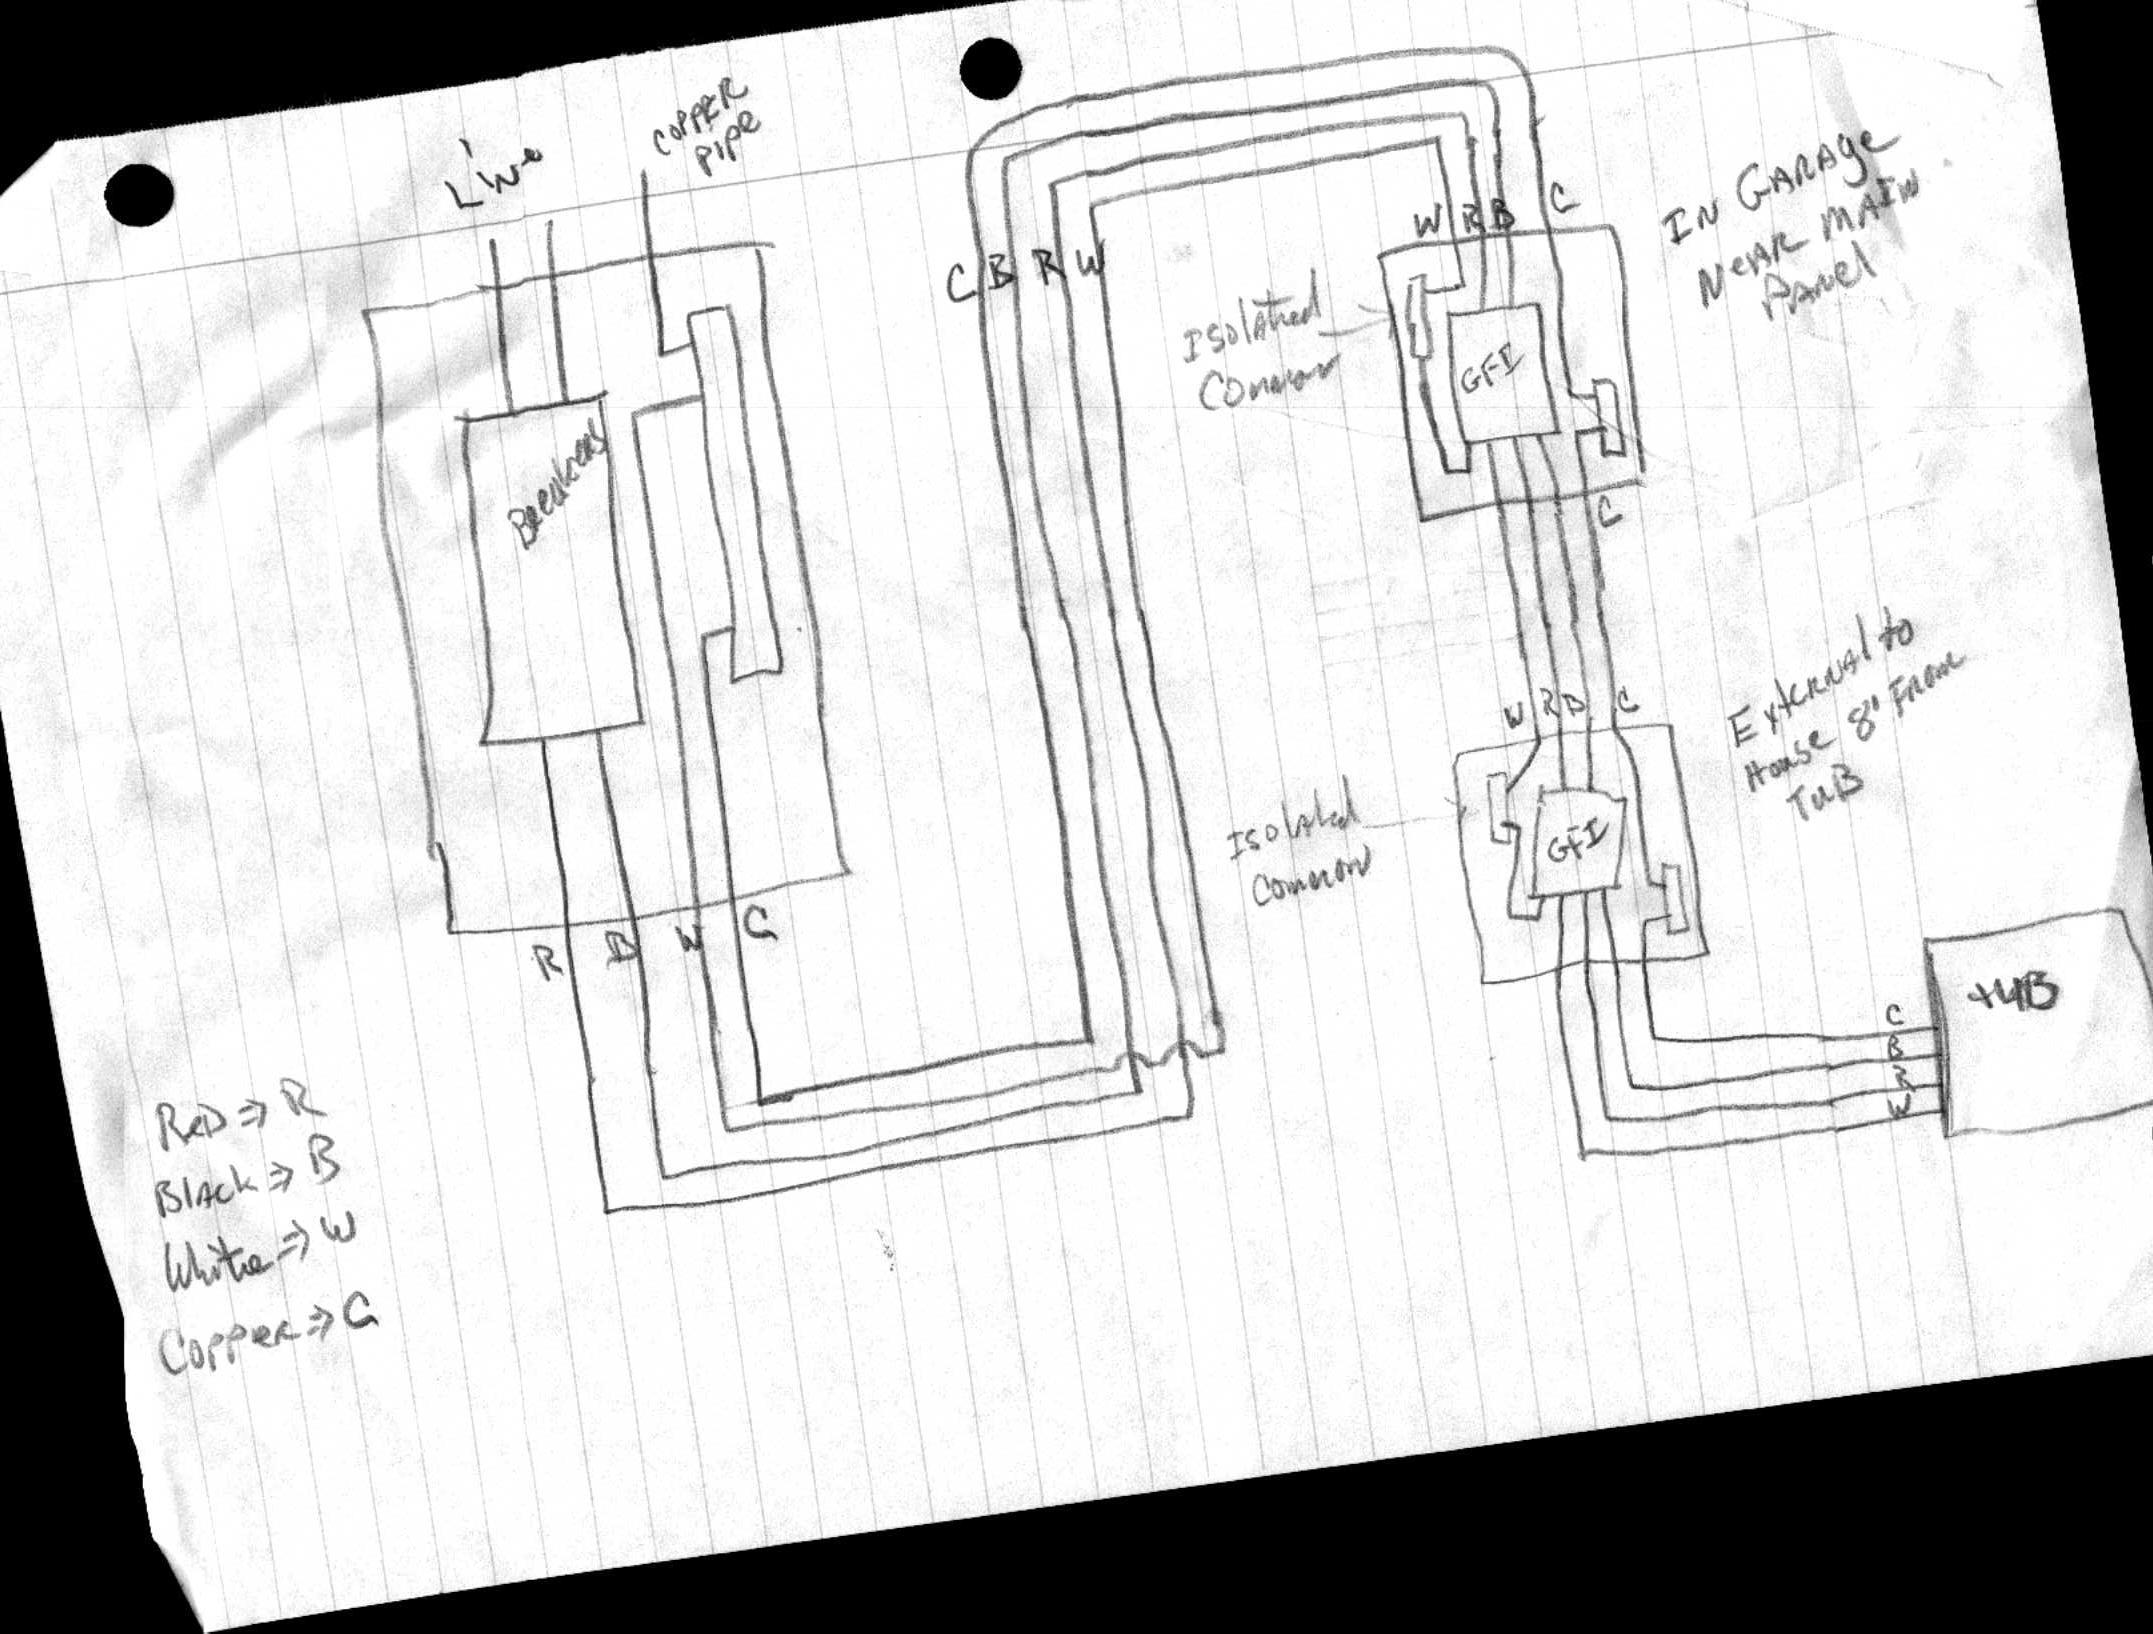 spa-gfci-wiring-diagram-2  Pole Ground Fault Breaker Wiring Diagram on